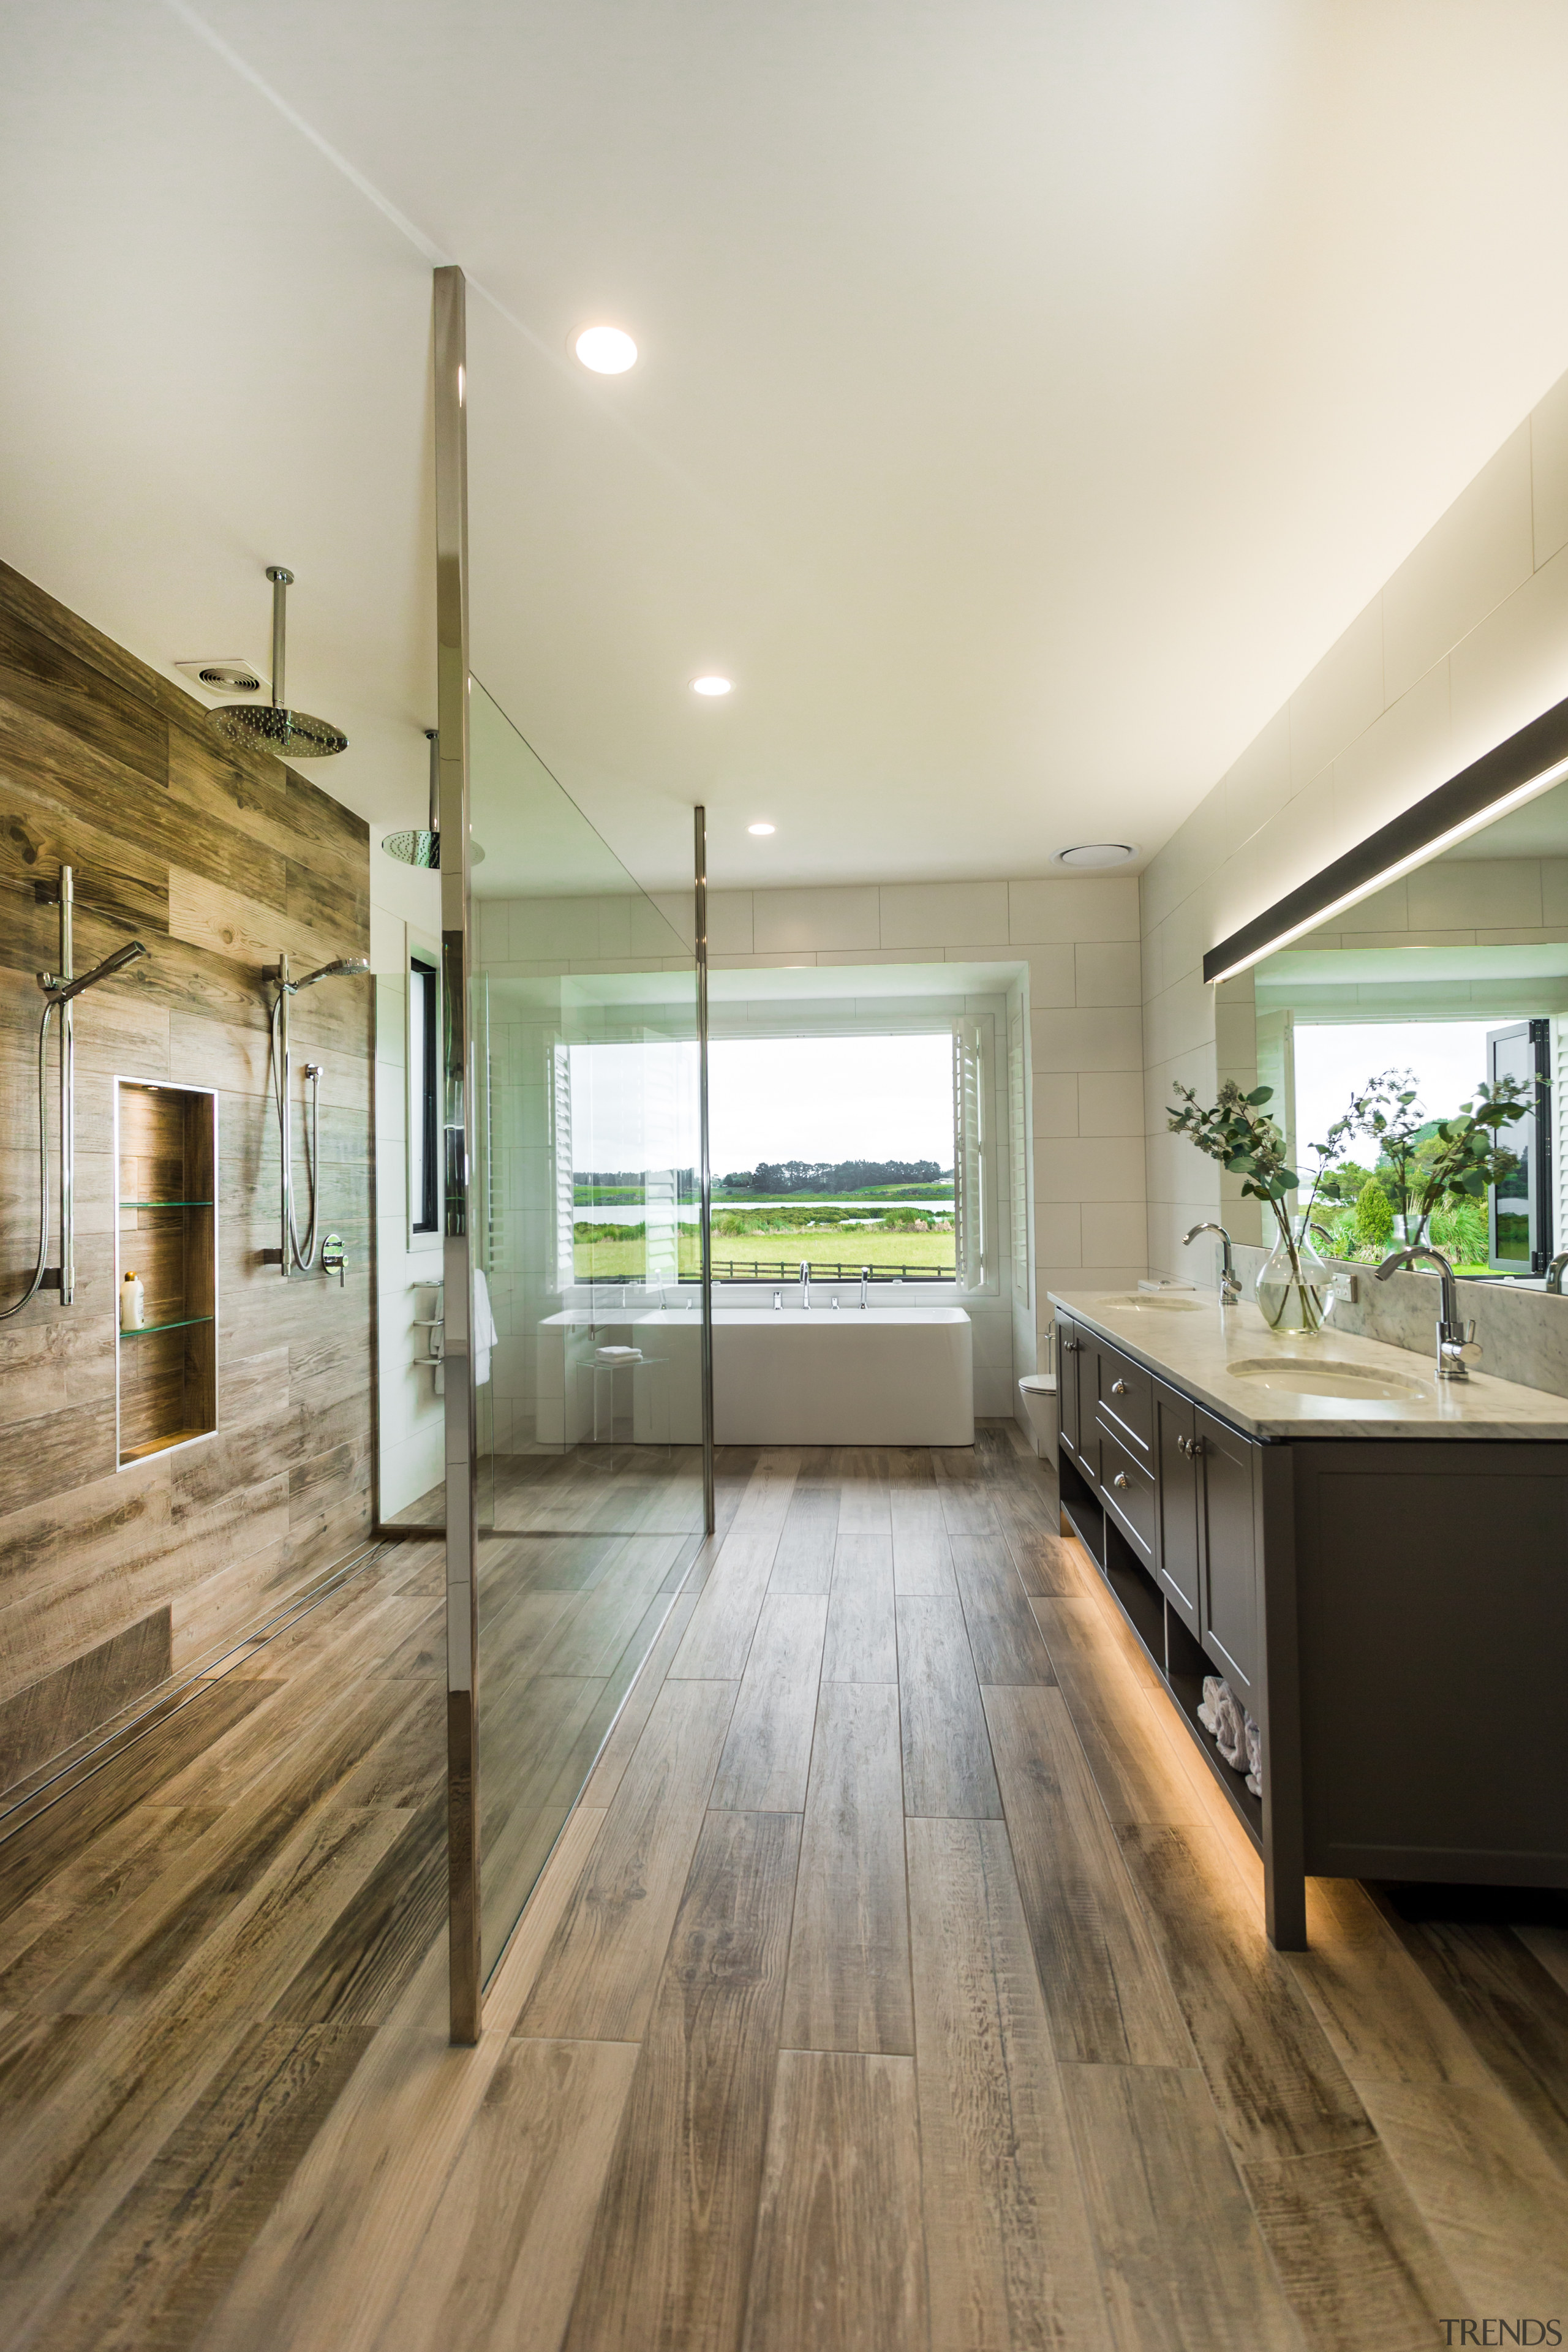 Wood-look ceramic floor tiles run the length of architecture, floor, flooring, ceramic tiles, yellowfox, vanity